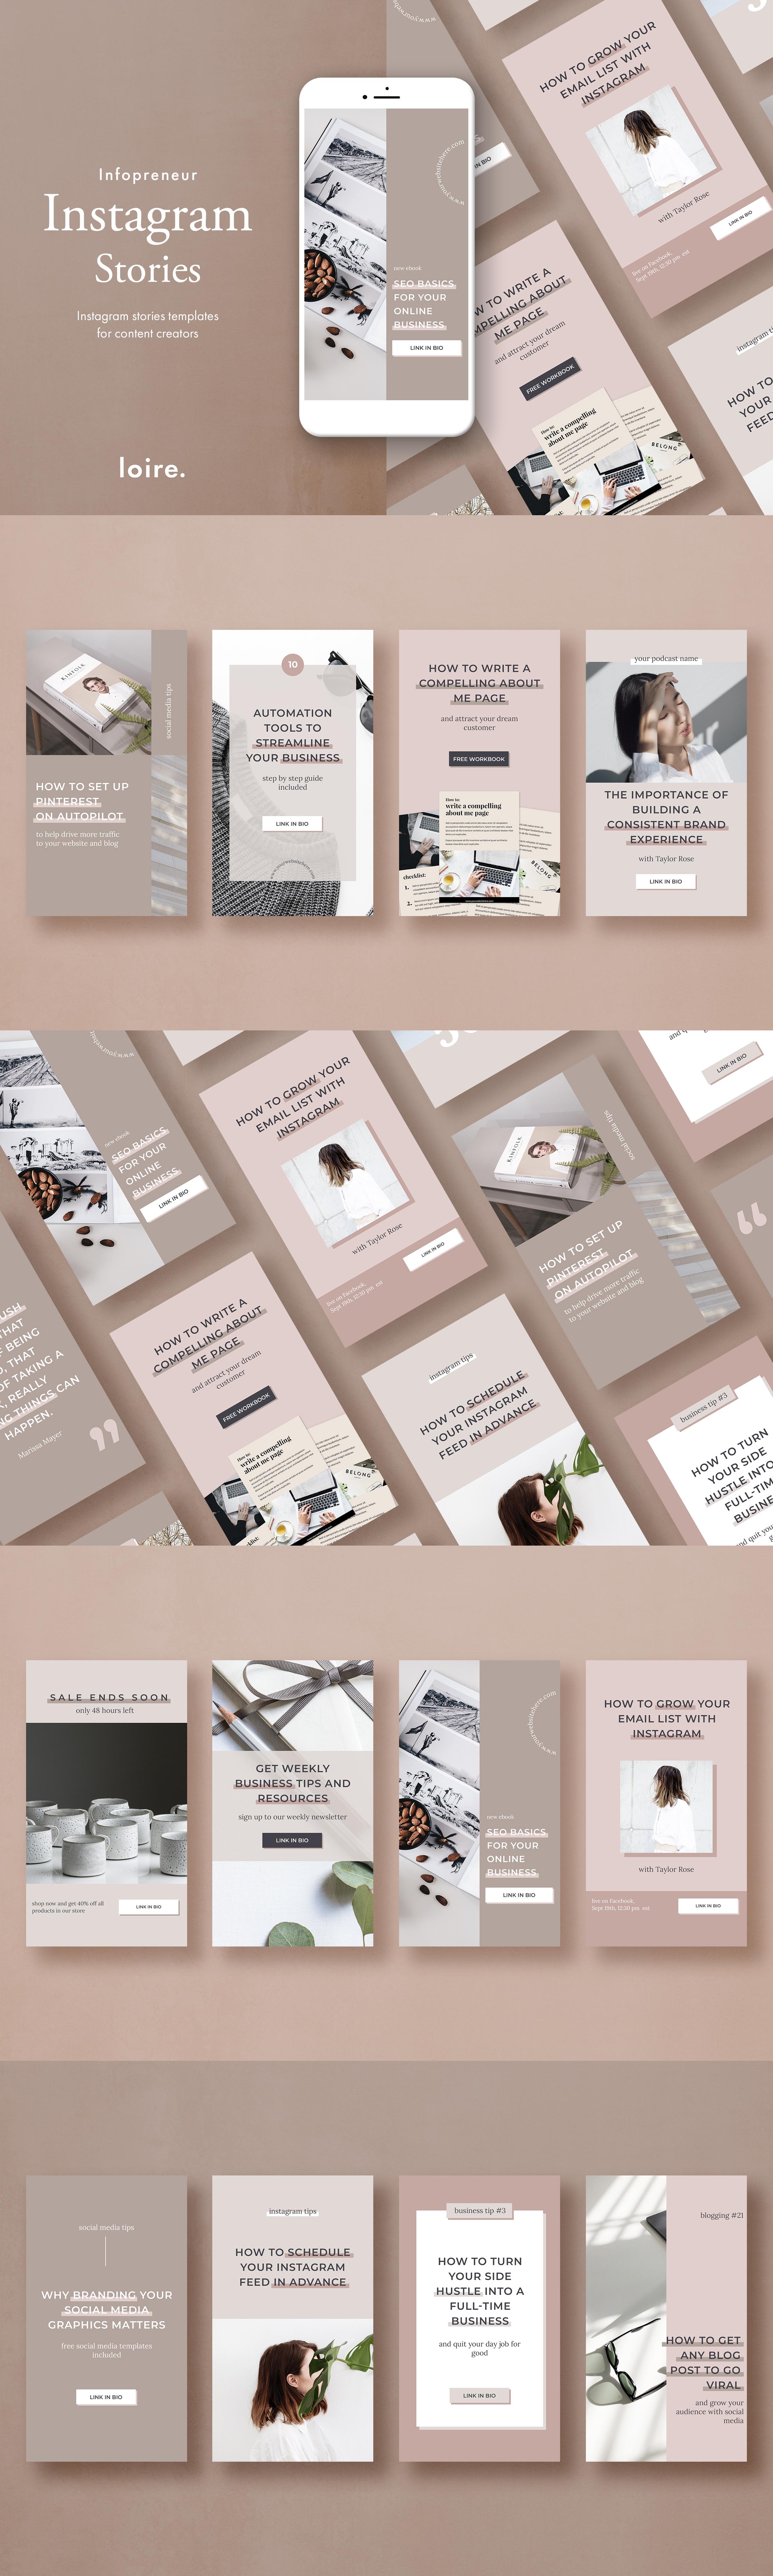 Instagram marketing bundle for bloggers example image 8